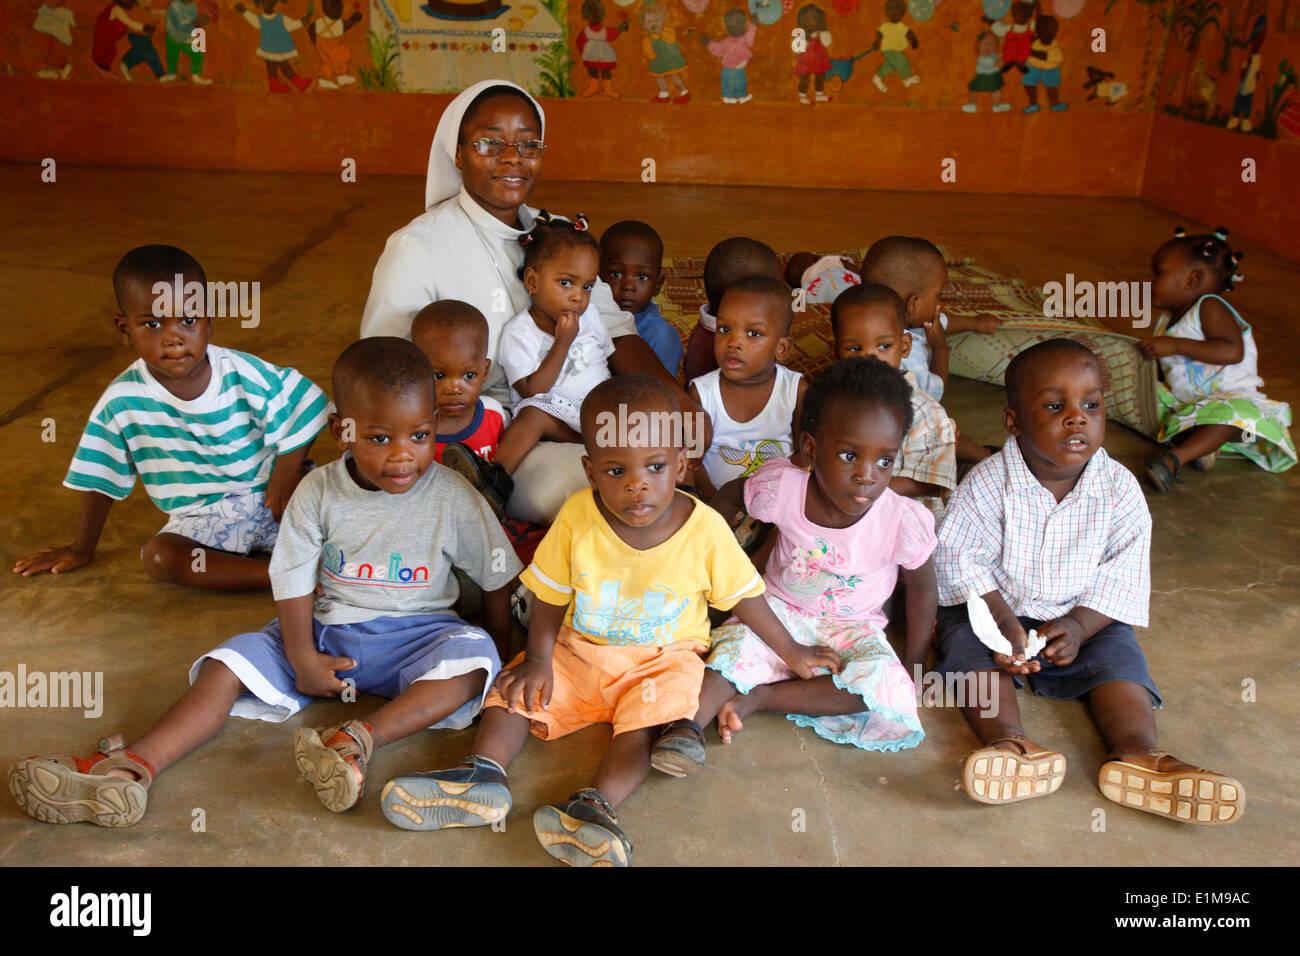 Kindergarten run by catholic nuns - Stock Image